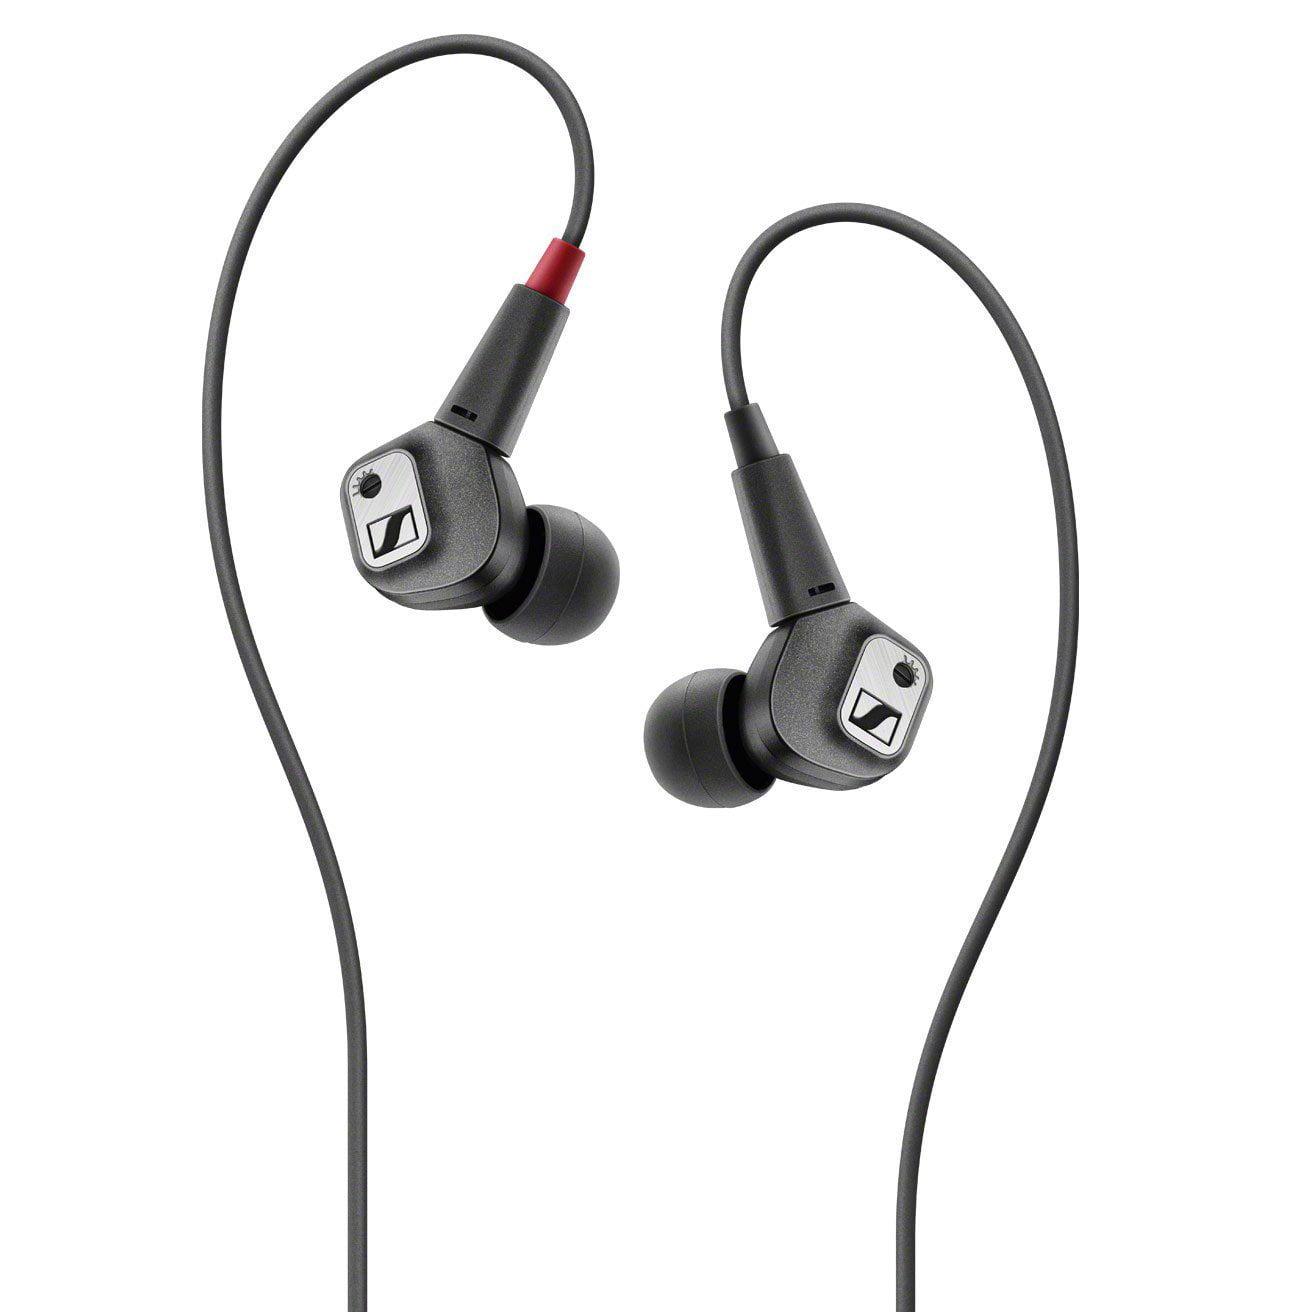 Sennheiser IE 80 S Pro-Inspired In-Ear Headphones by Sennheiser